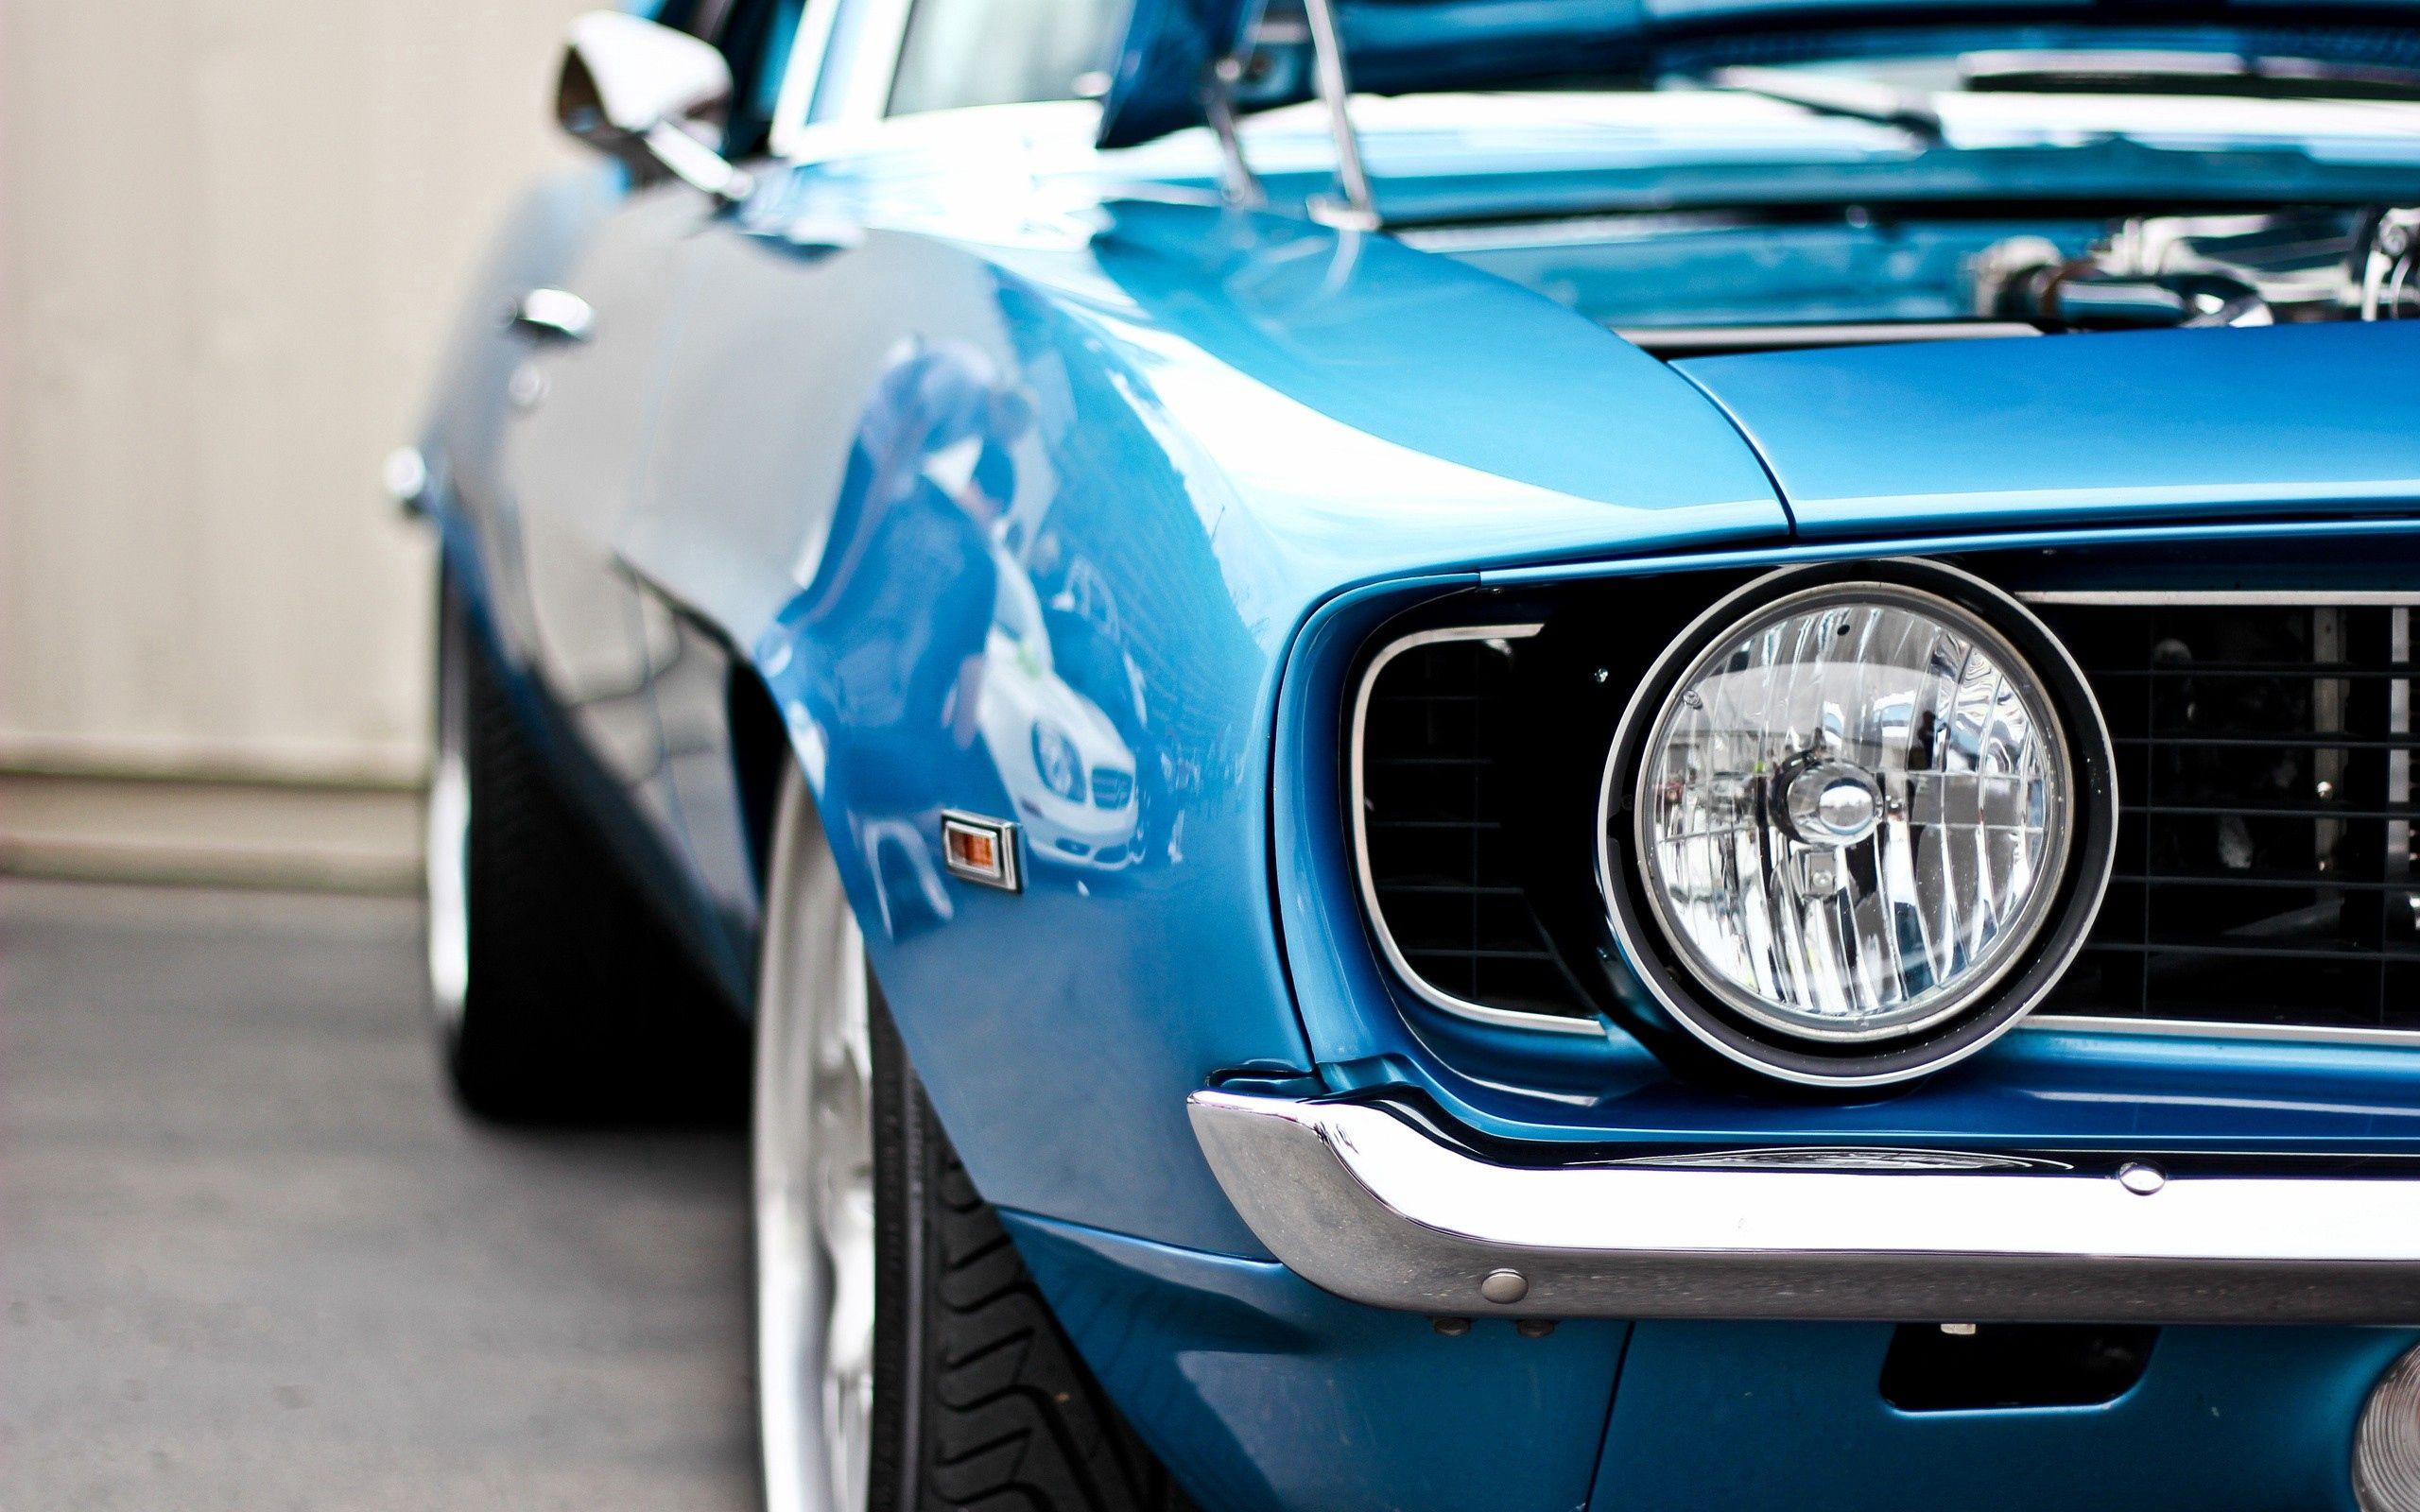 142909 Заставки и Обои Мустанг (Mustang) на телефон. Скачать Мустанг (Mustang), Машины, Форд (Ford), Тачки (Cars), Машина, Стиль, Muscle Cars картинки бесплатно